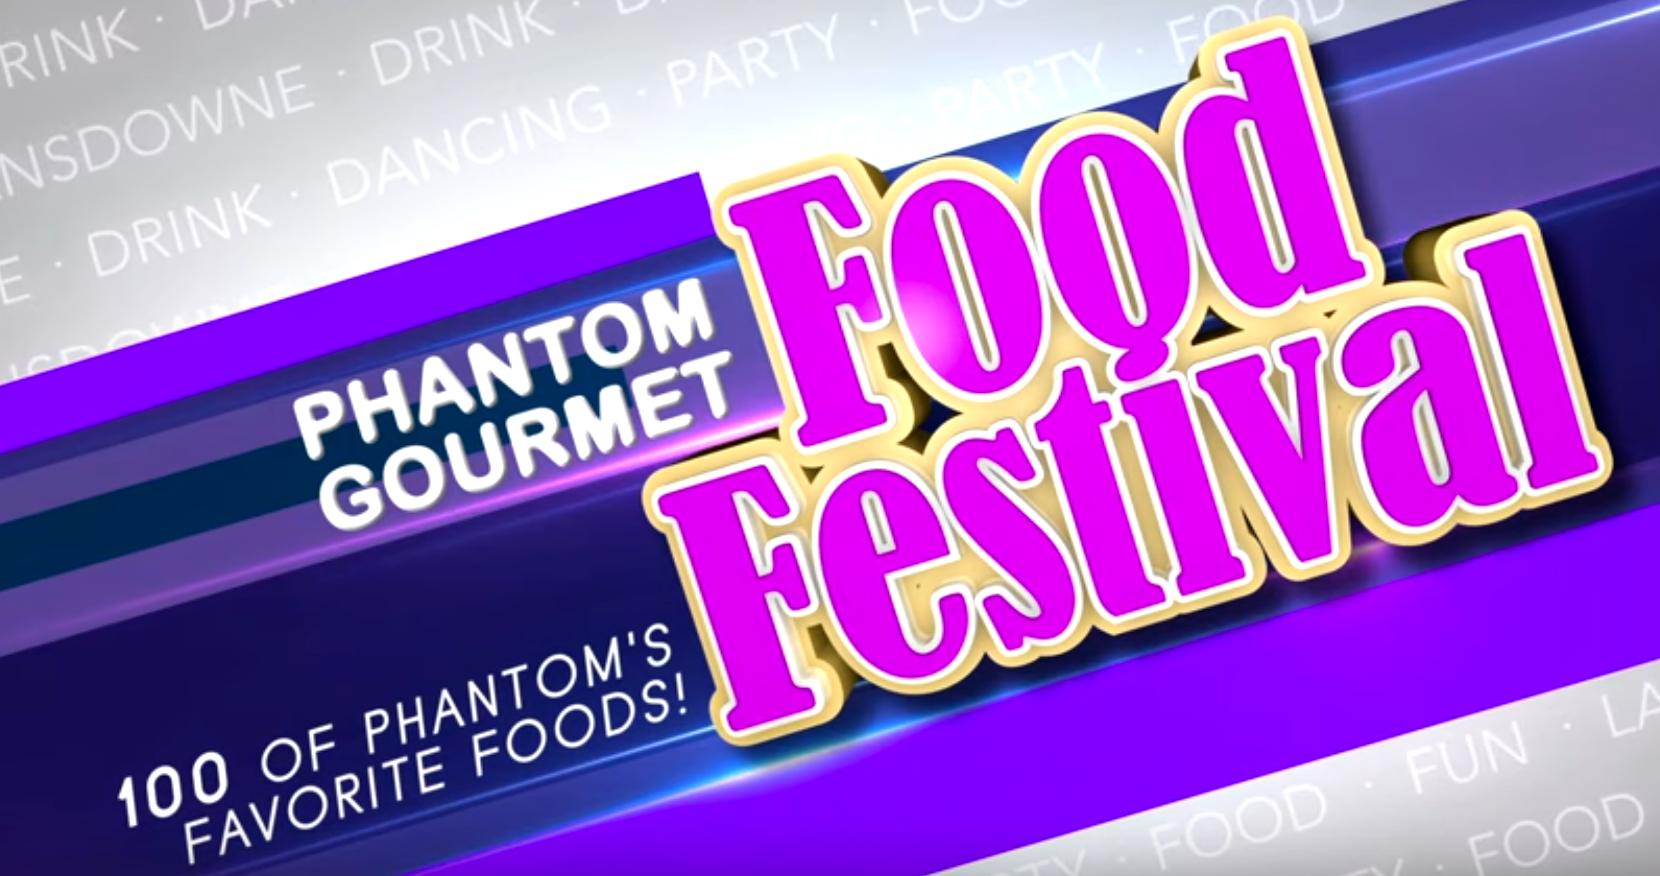 Phantom Gourmet Food Festival 2020 Phantom Gourmet Food Festival